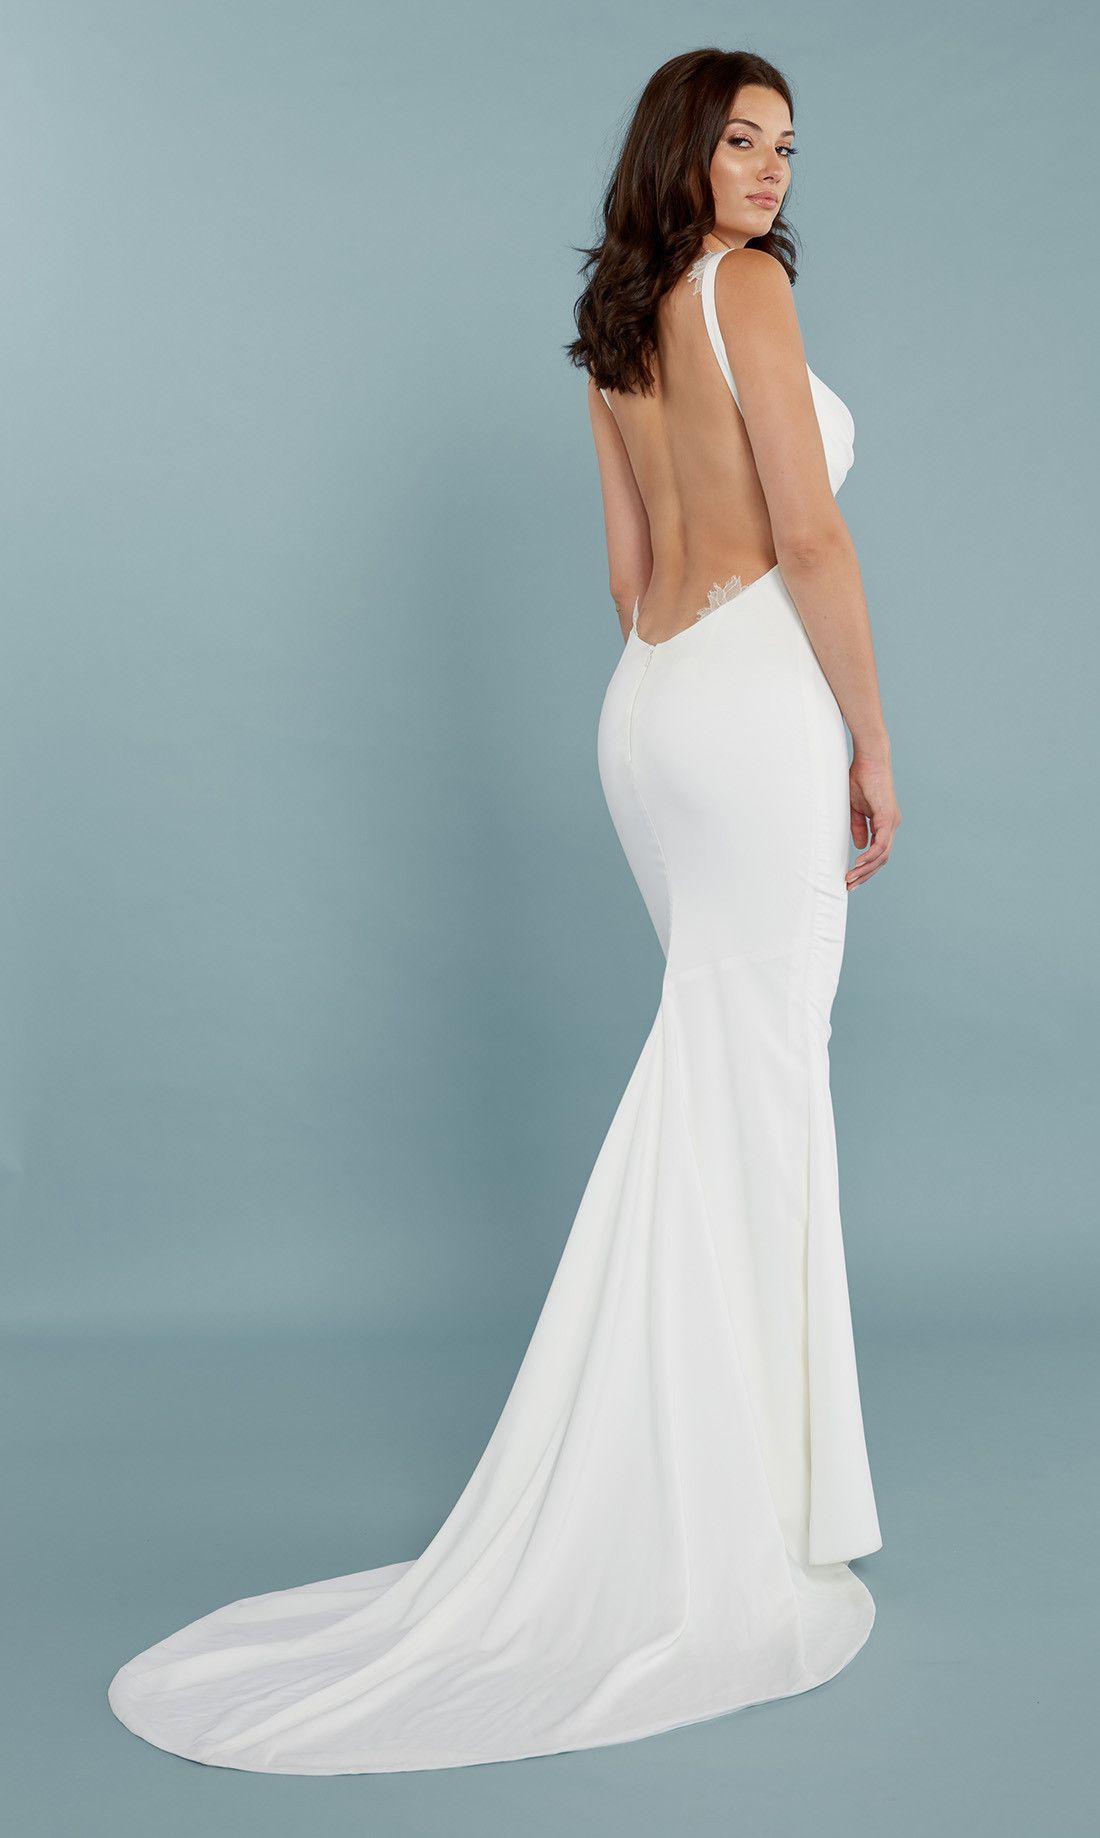 Unique Bridesmaid Dresses Design Your Own Motif - All Wedding ...